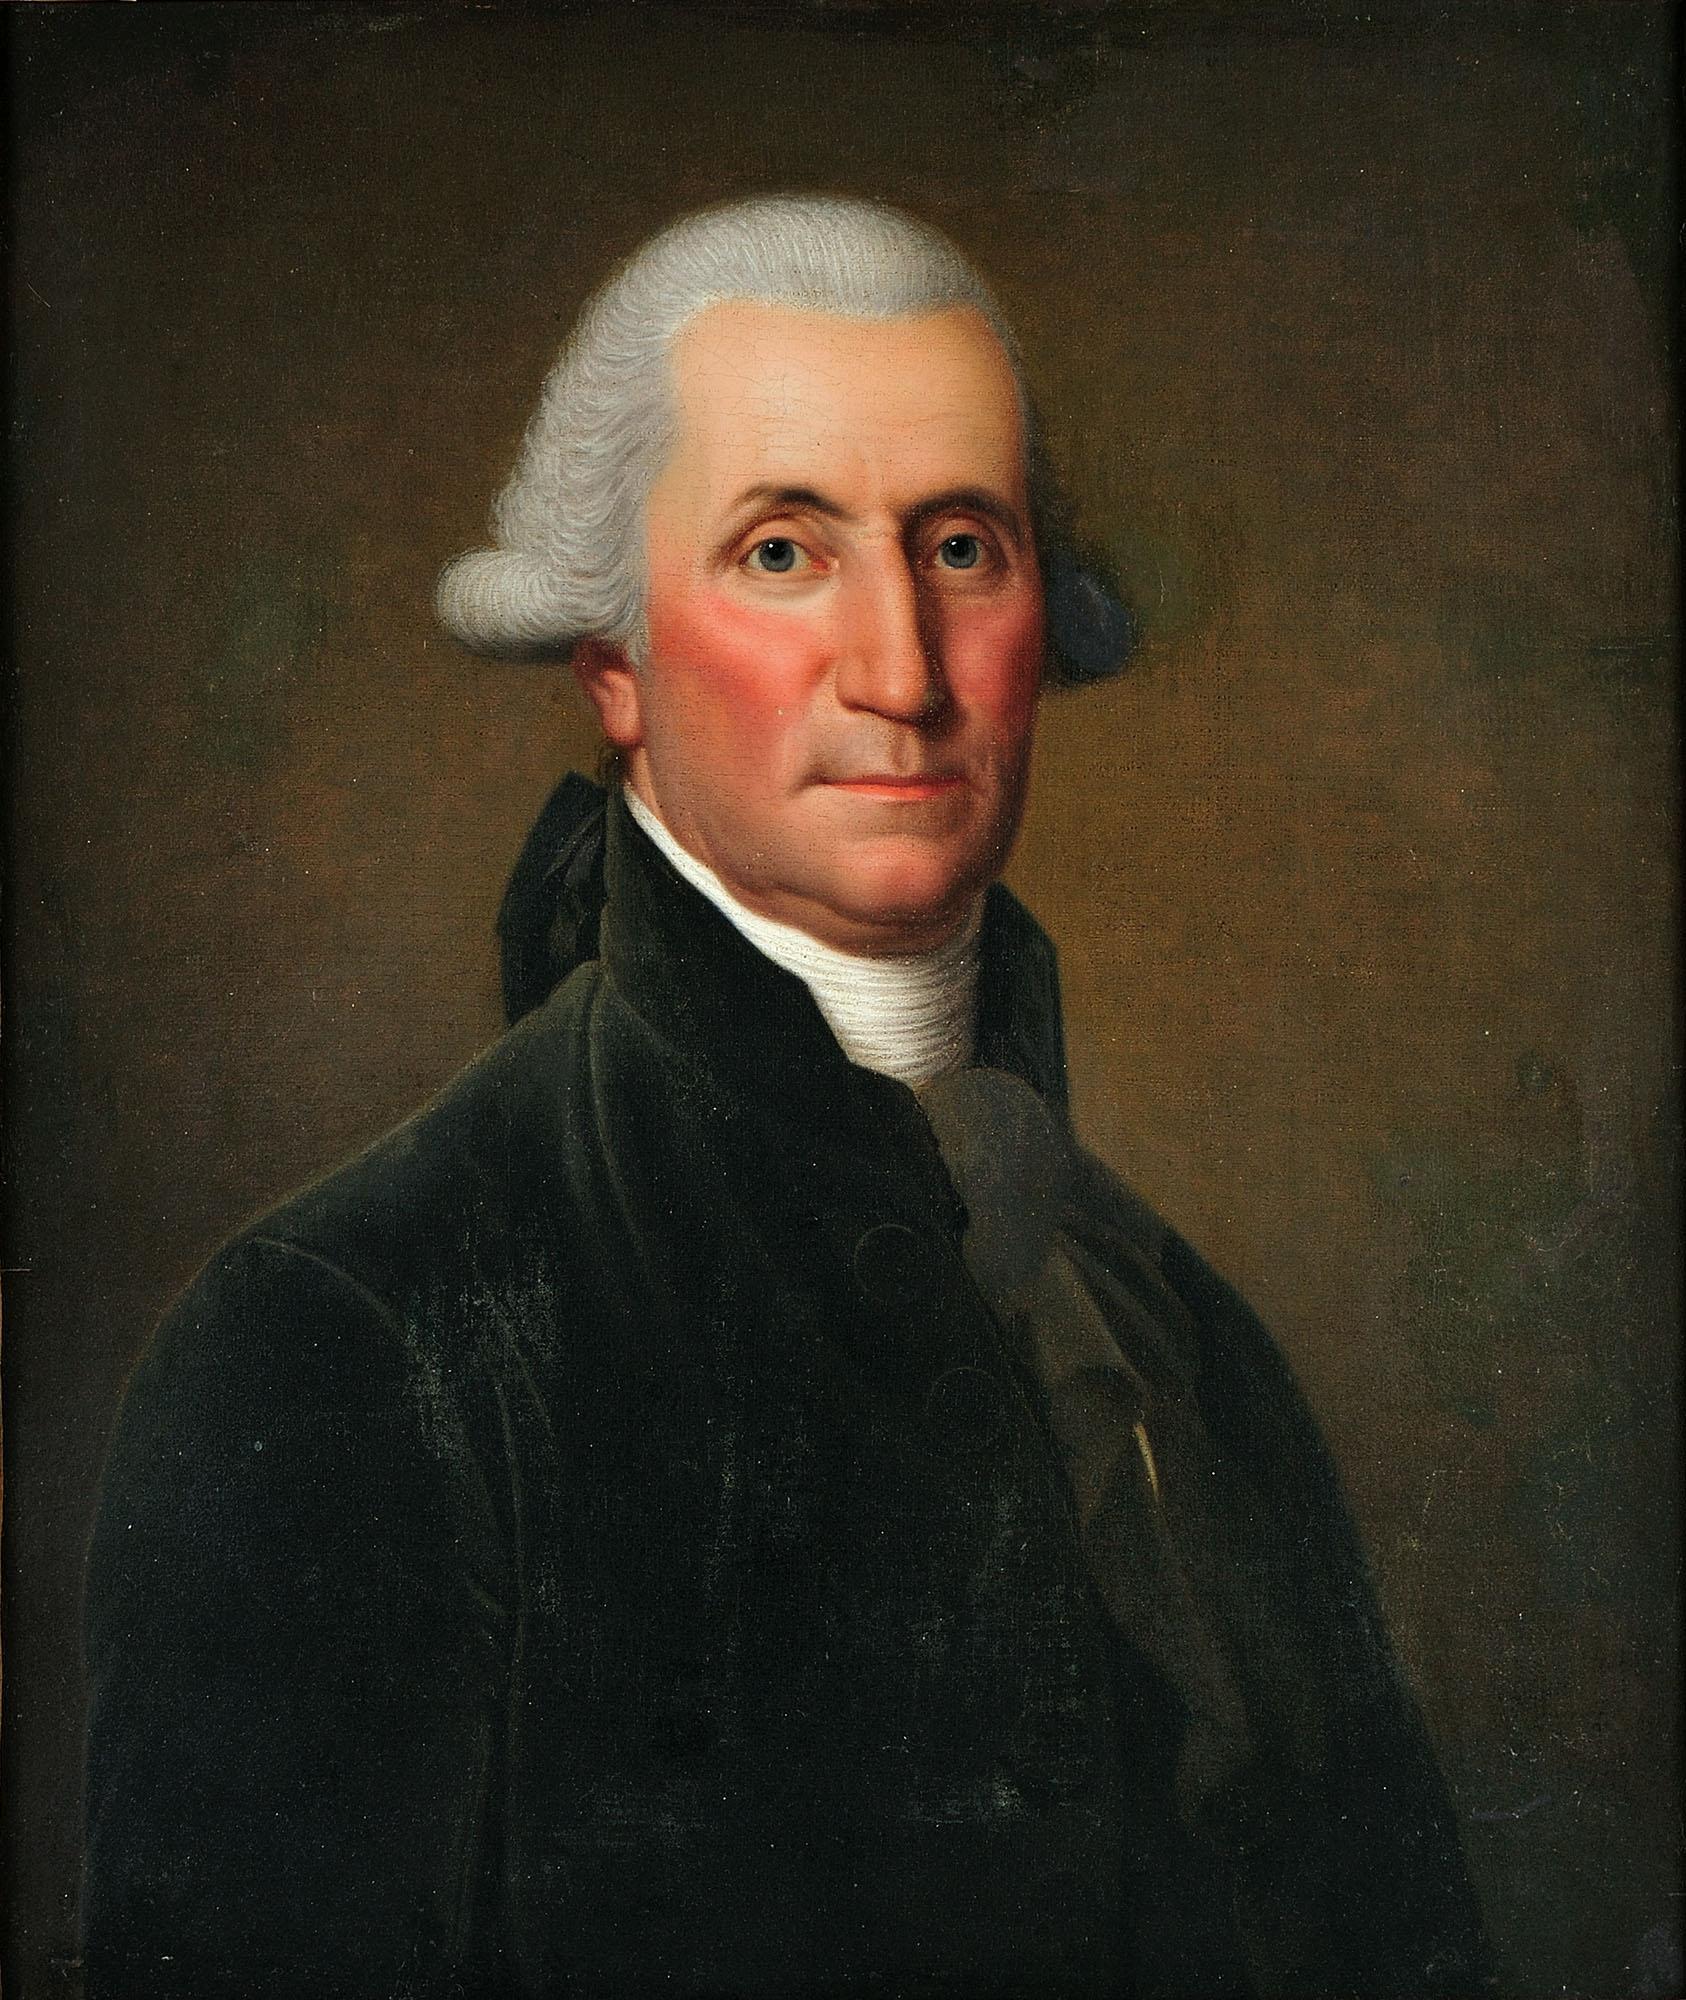 George Washington, c. 1795, Adolf Ulrik Wertmüller, Purchased by the Connoisseur Society of Mount Vernon, 2011, H-4902